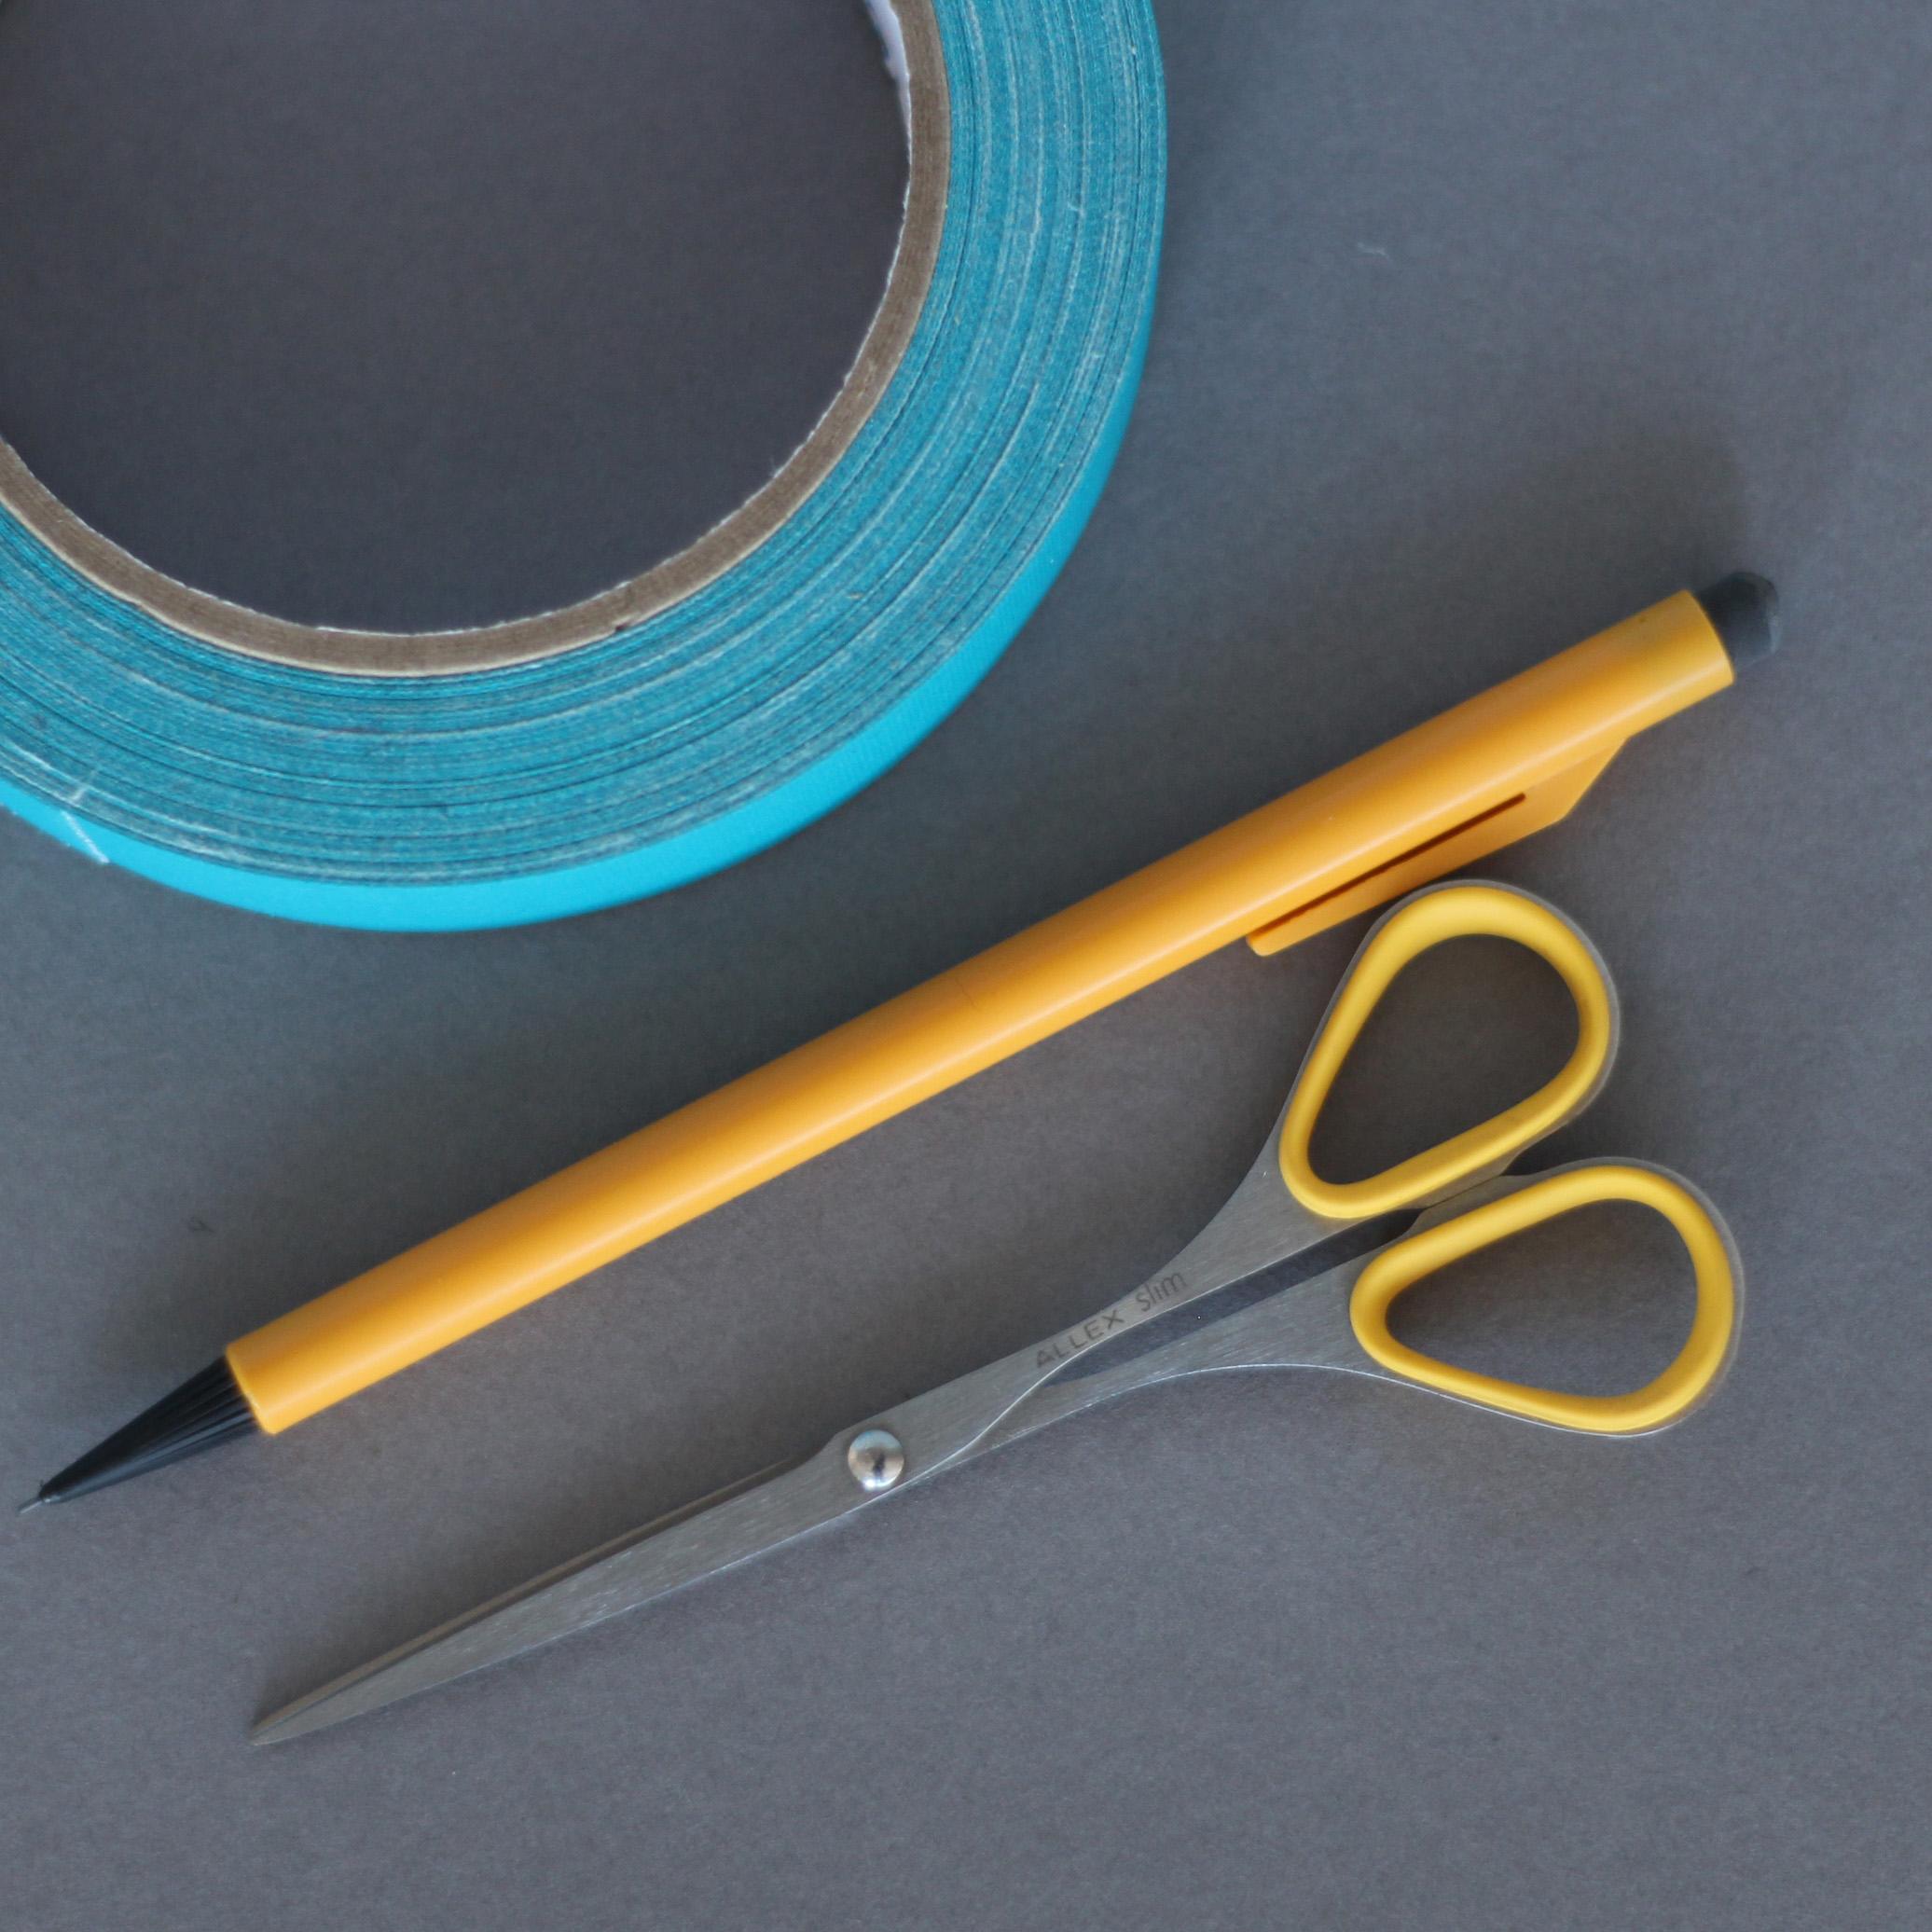 Eleanor_Pritchard_tape_scissors.jpg